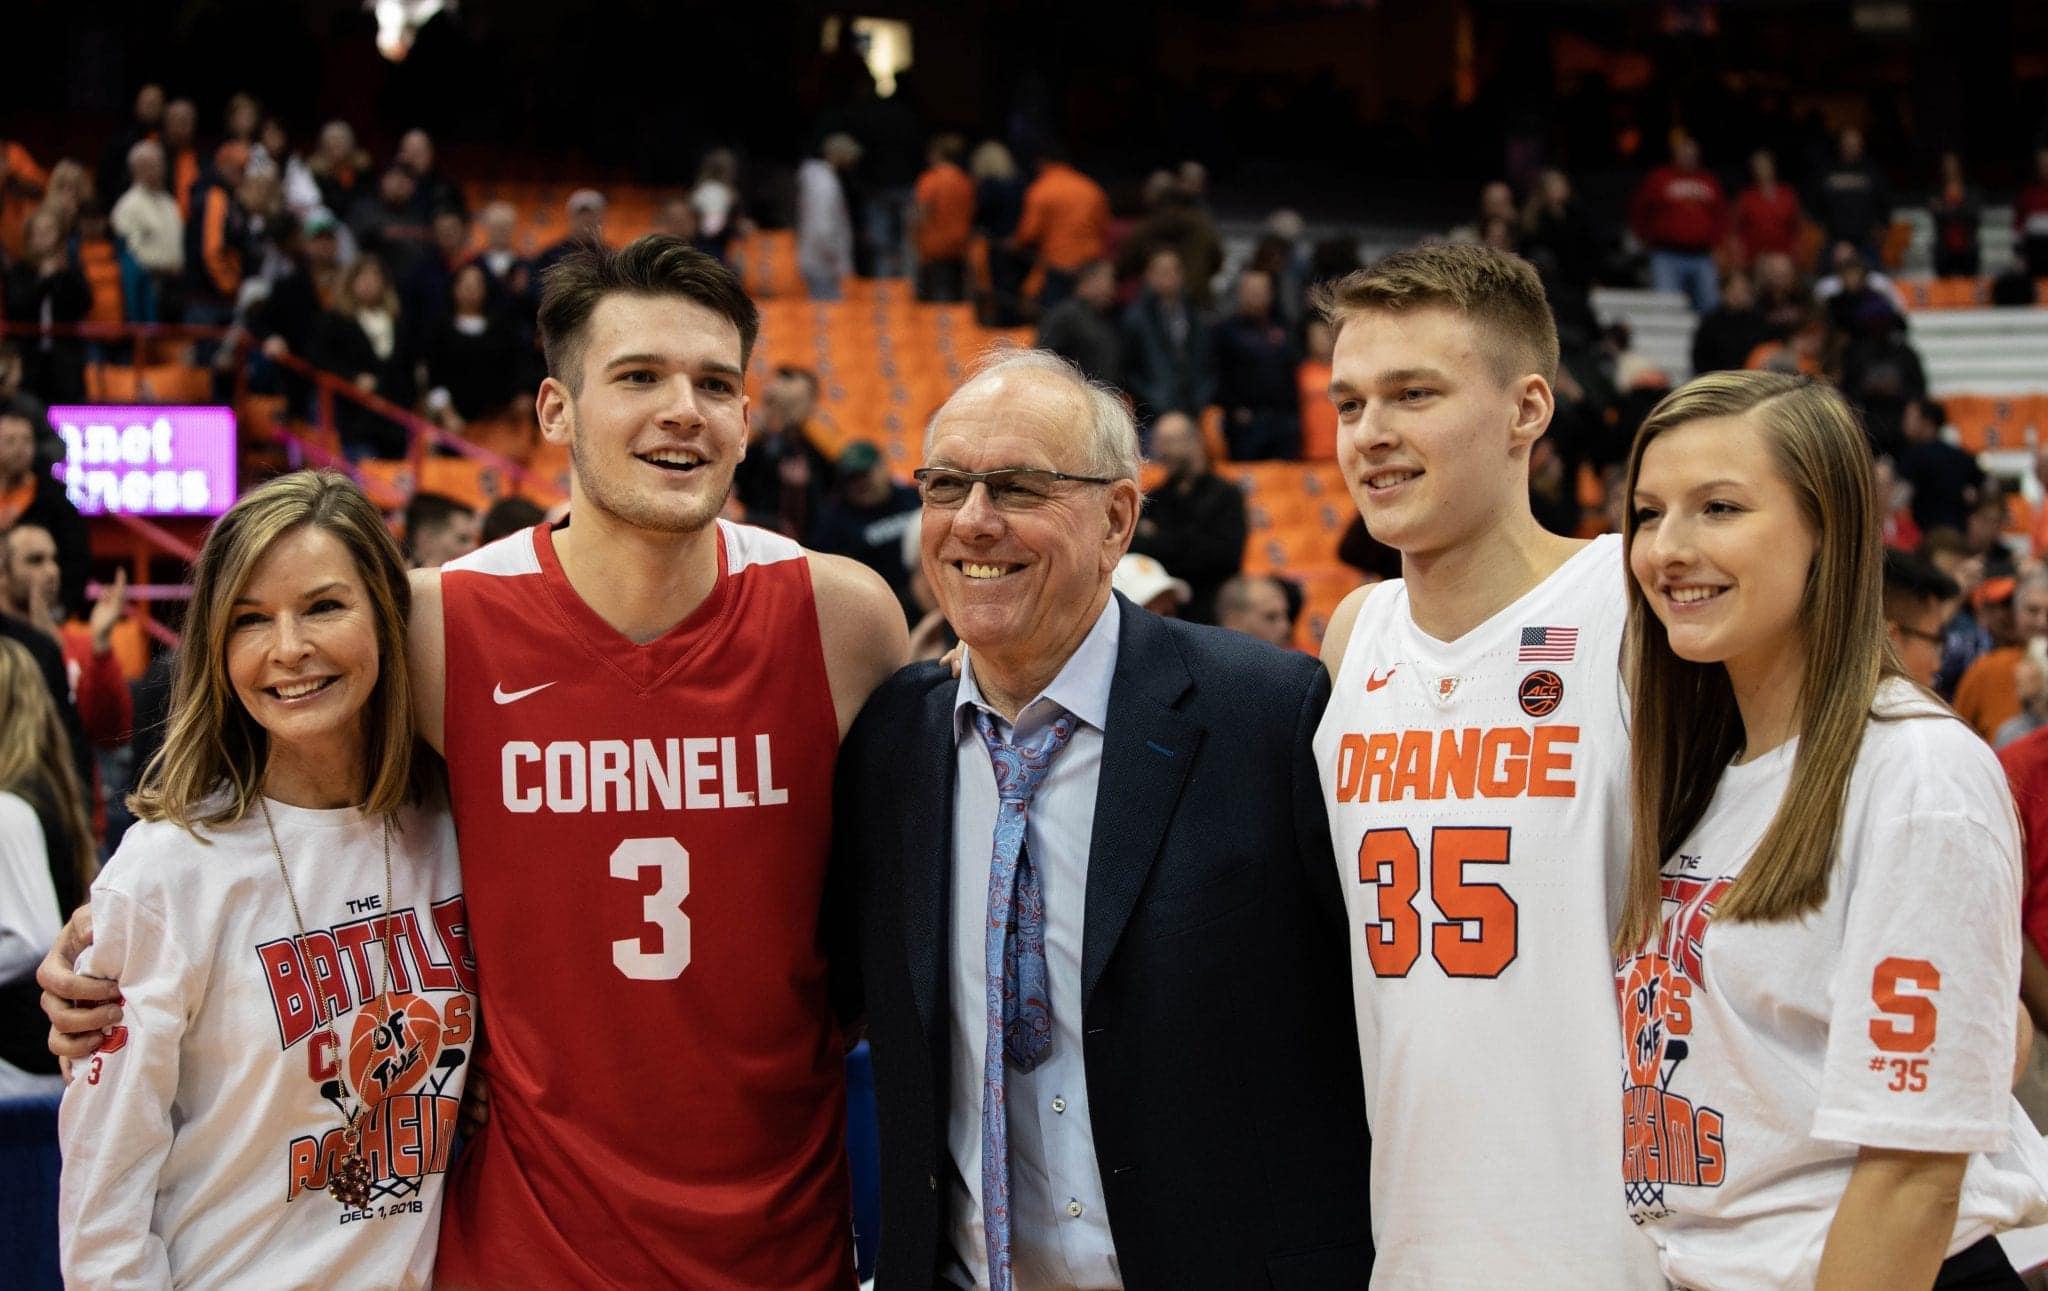 Battle Brissett Guide The Orange To A Win Over Cornell The Newshouse